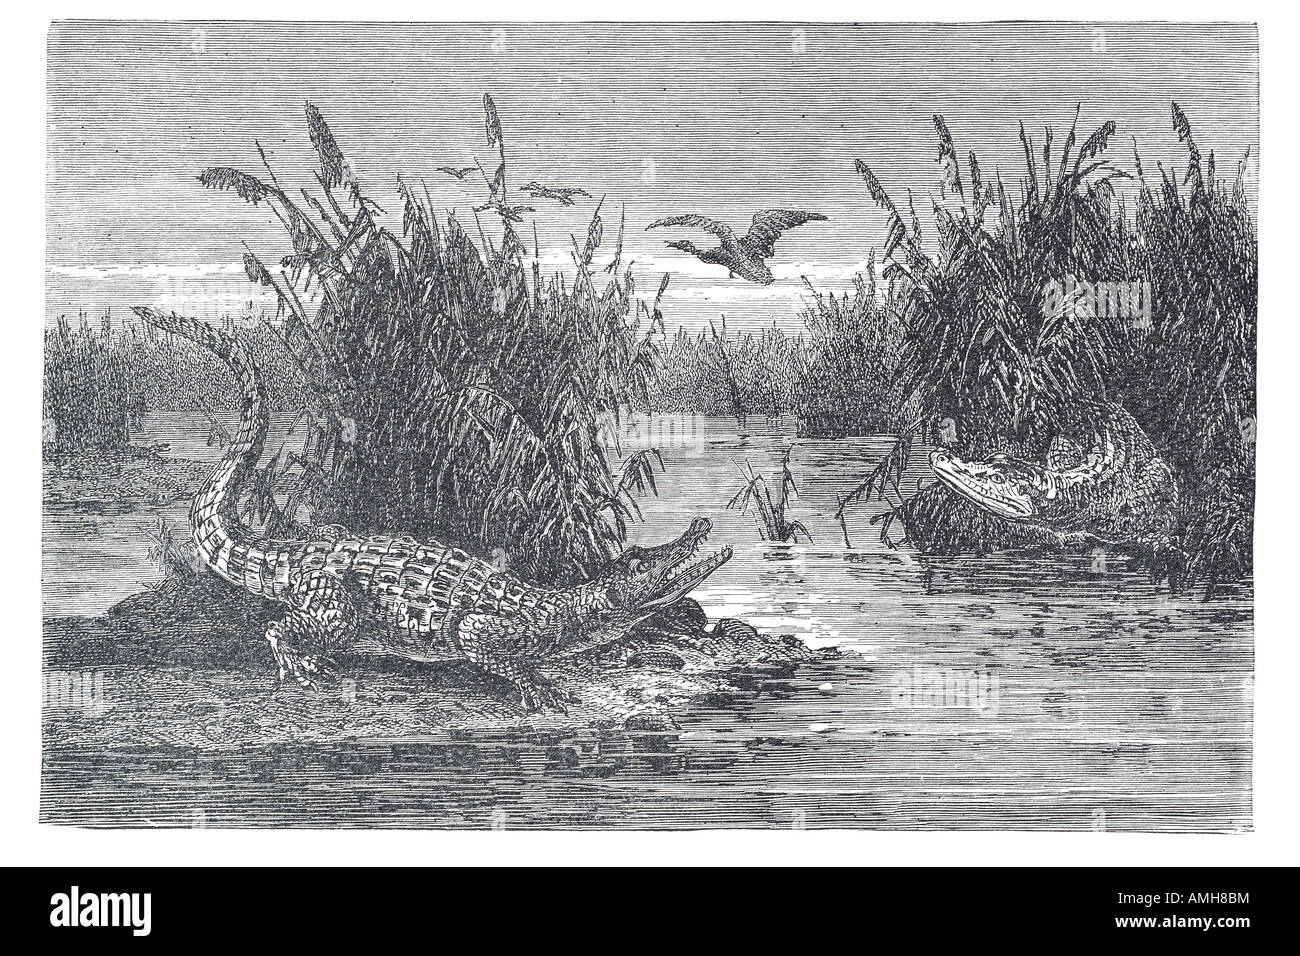 sarawak crocodile Crocodylidae Crocodylinae Crocodilia alligators caimans Alligatoridae gharials Gavialidae Crocodylomorpha - Stock Image